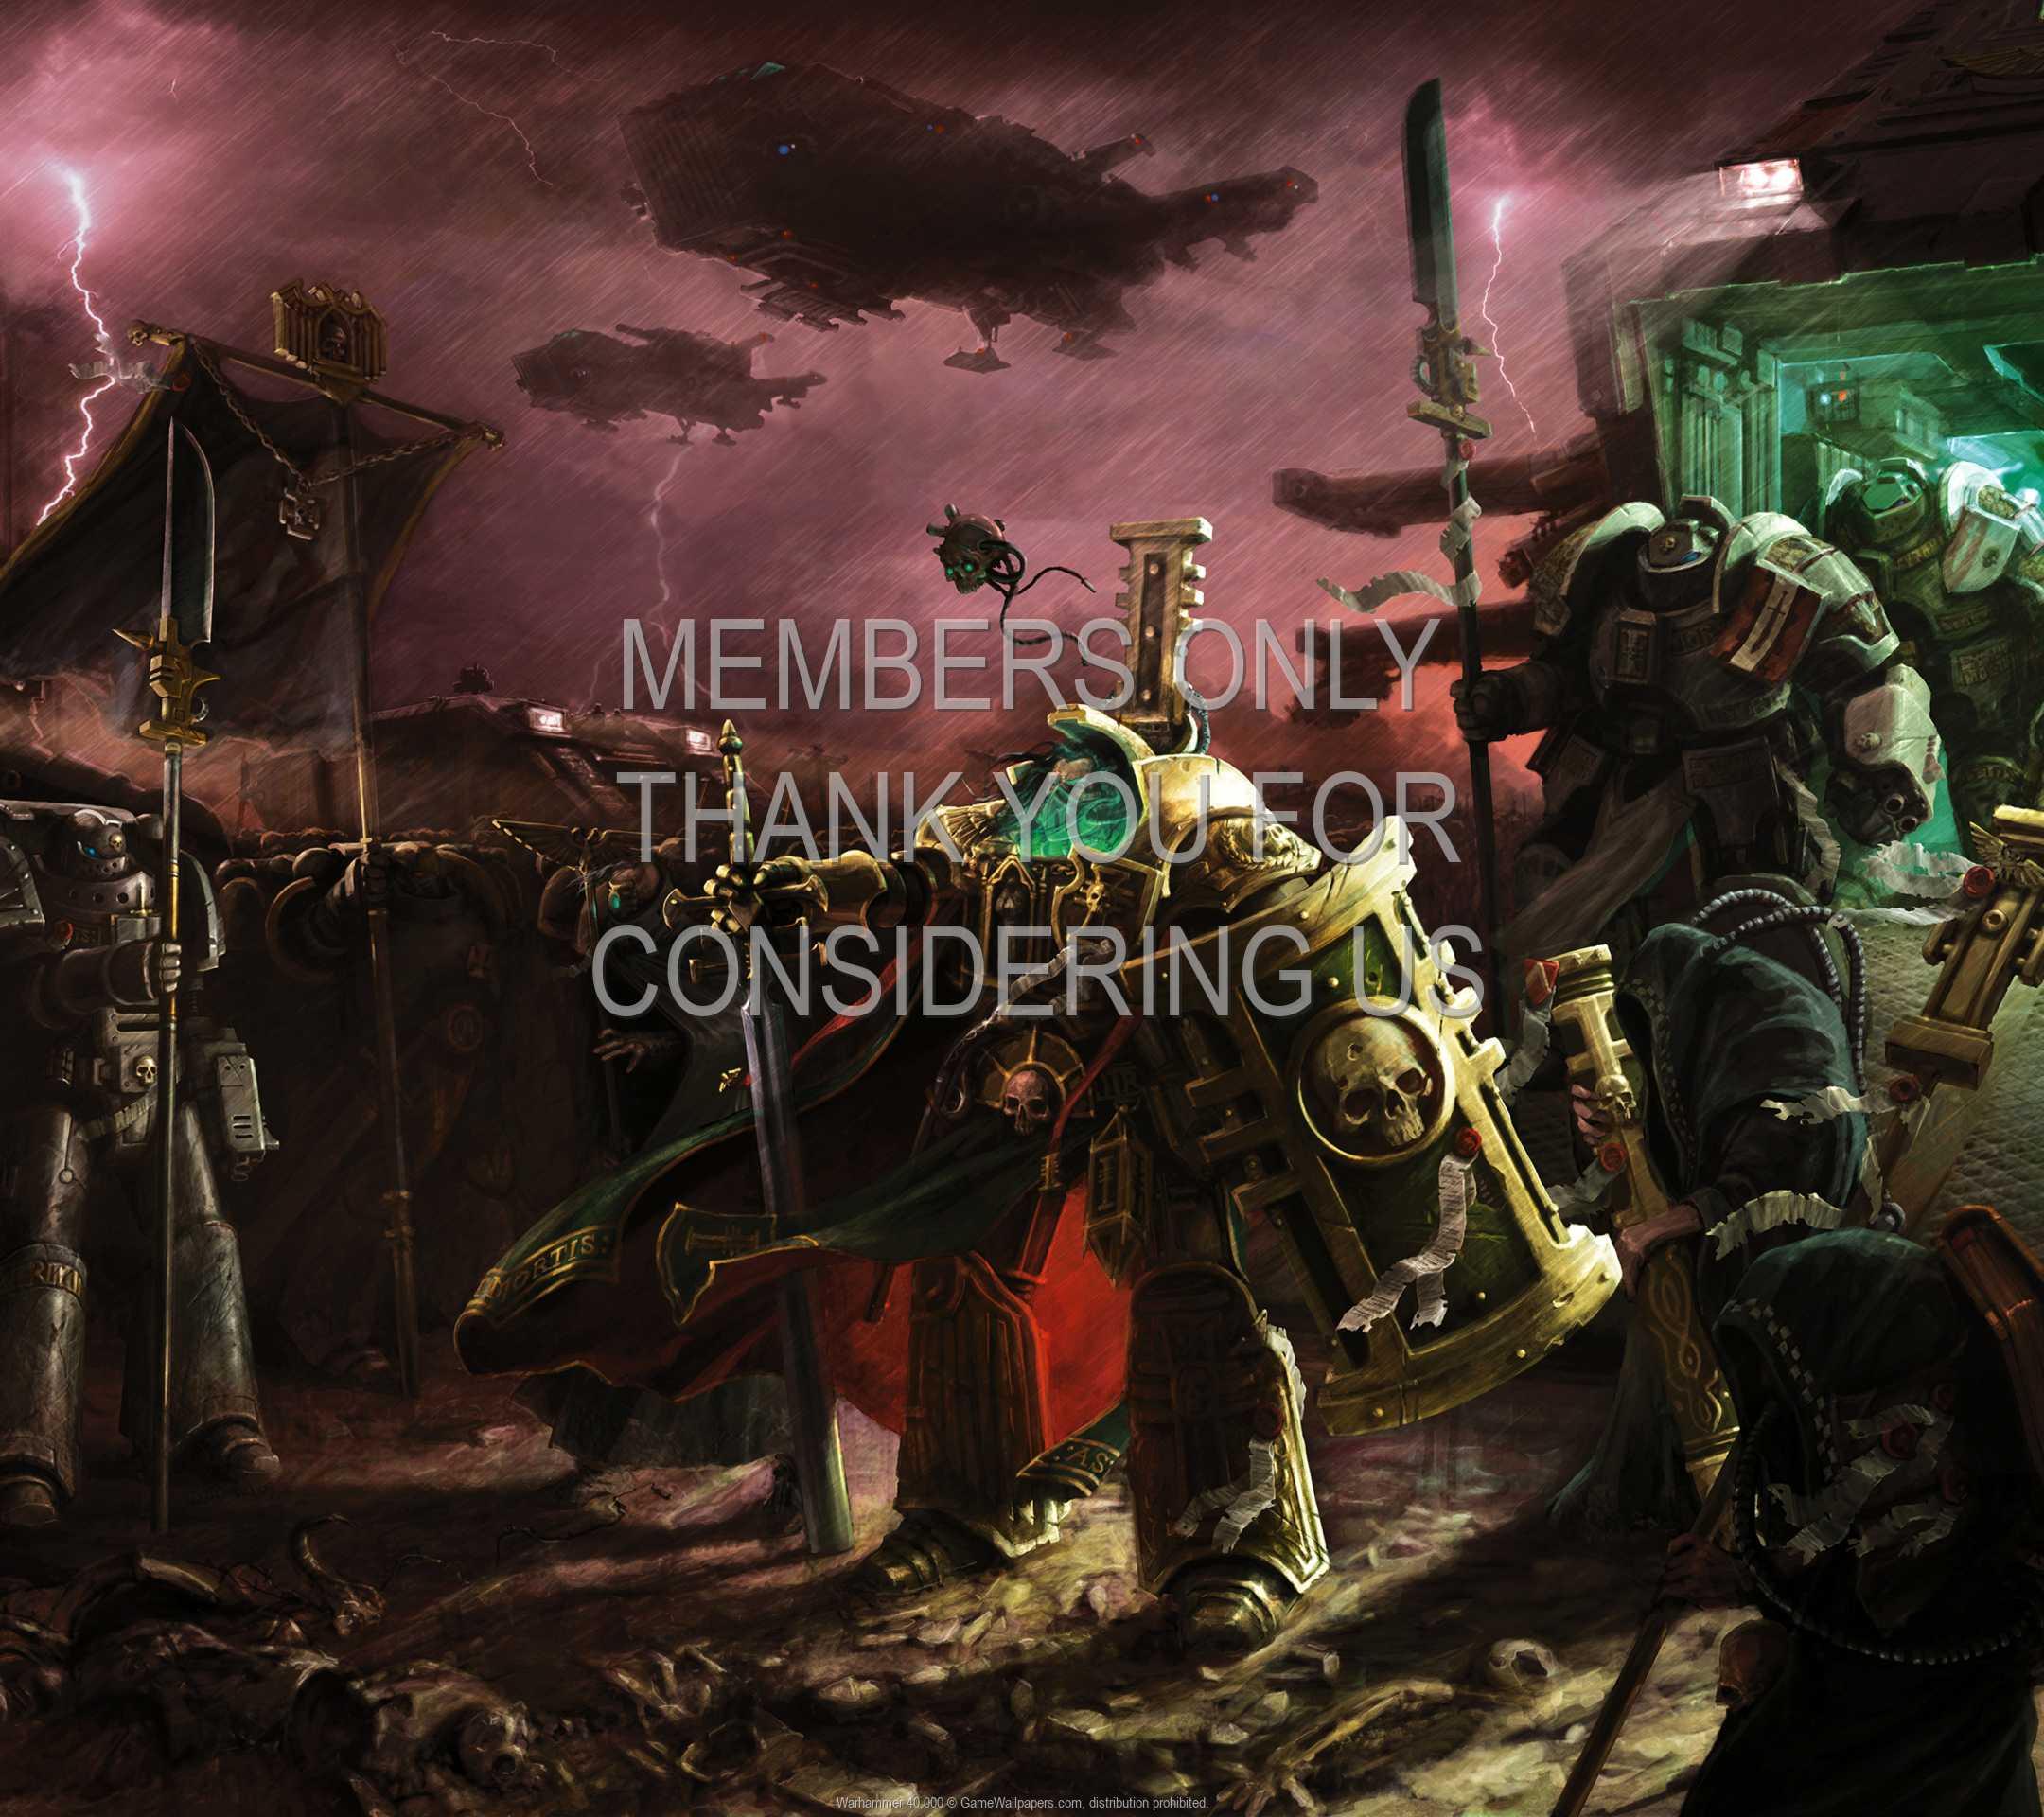 Warhammer 40,000 1080p Horizontal Handy Hintergrundbild 05